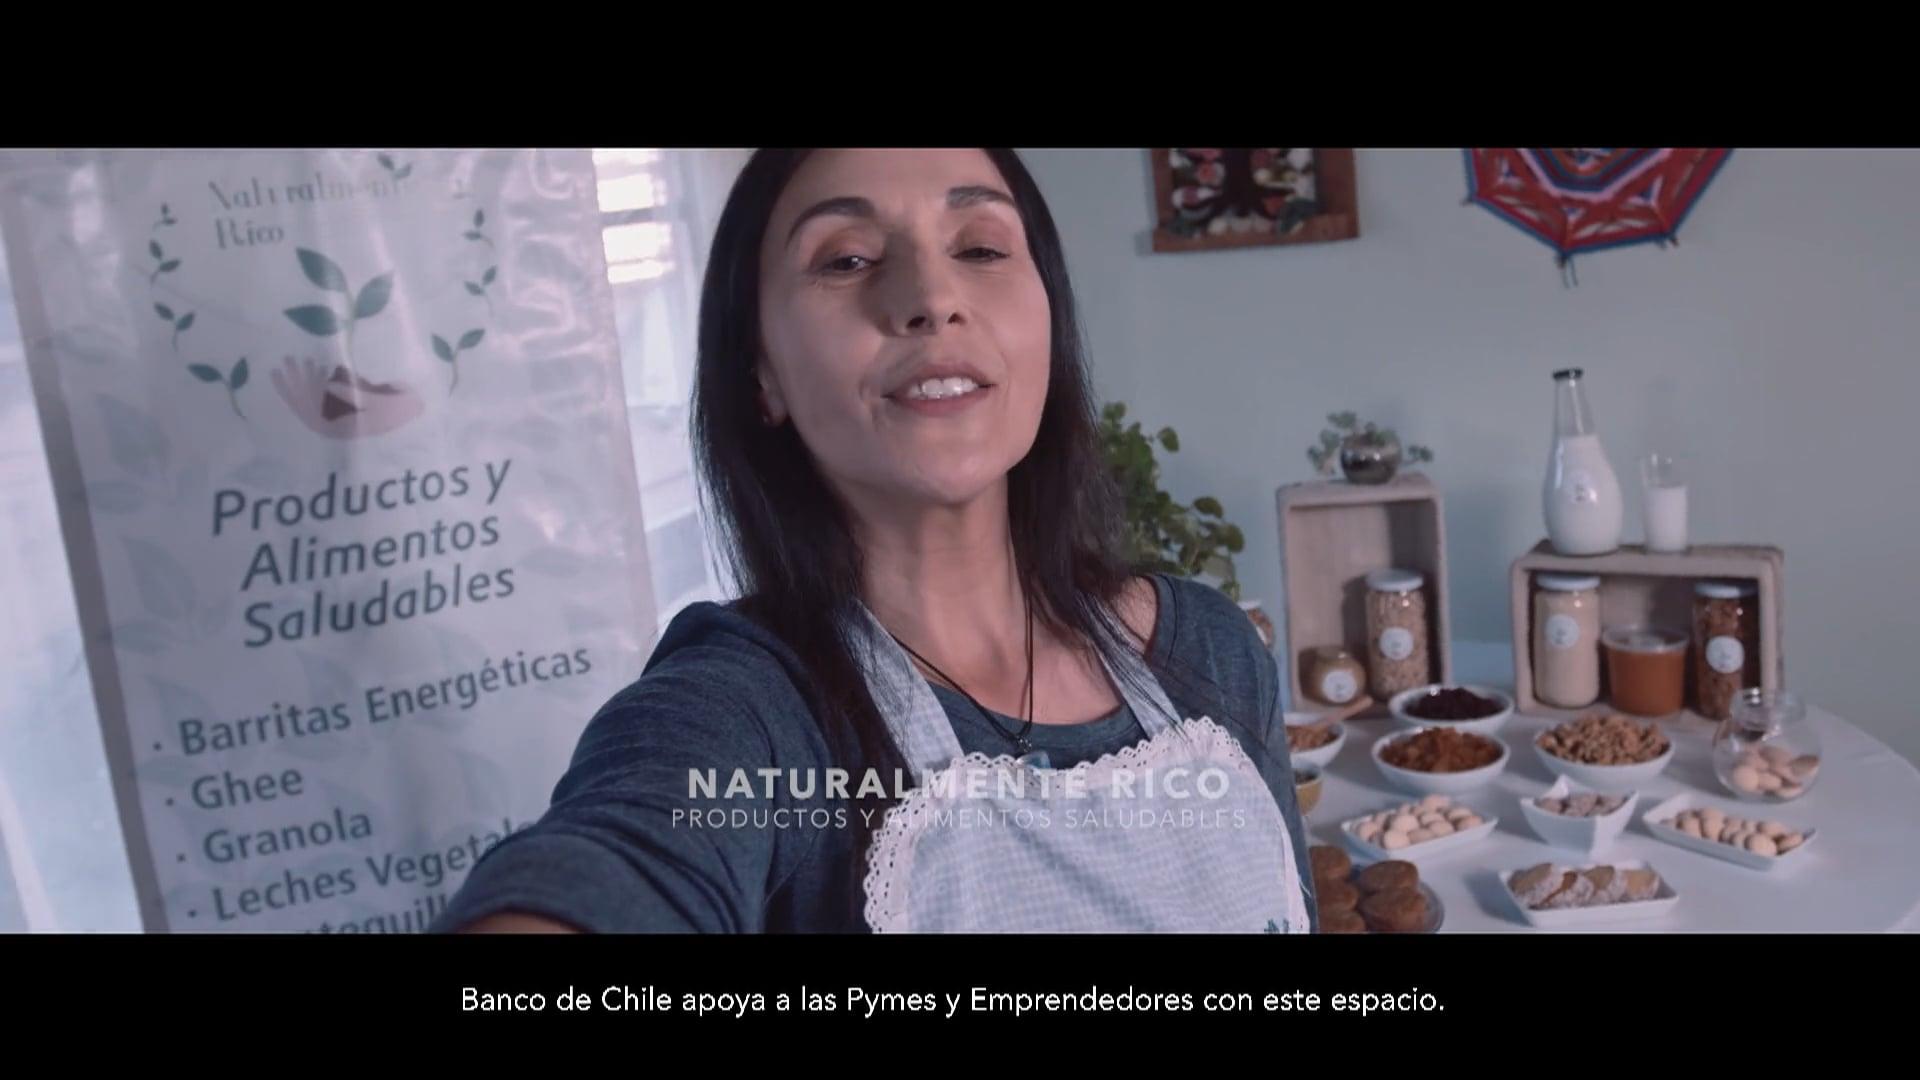 BAMCO DE CHILE PYMES NATURALMENTE RICO MEGA